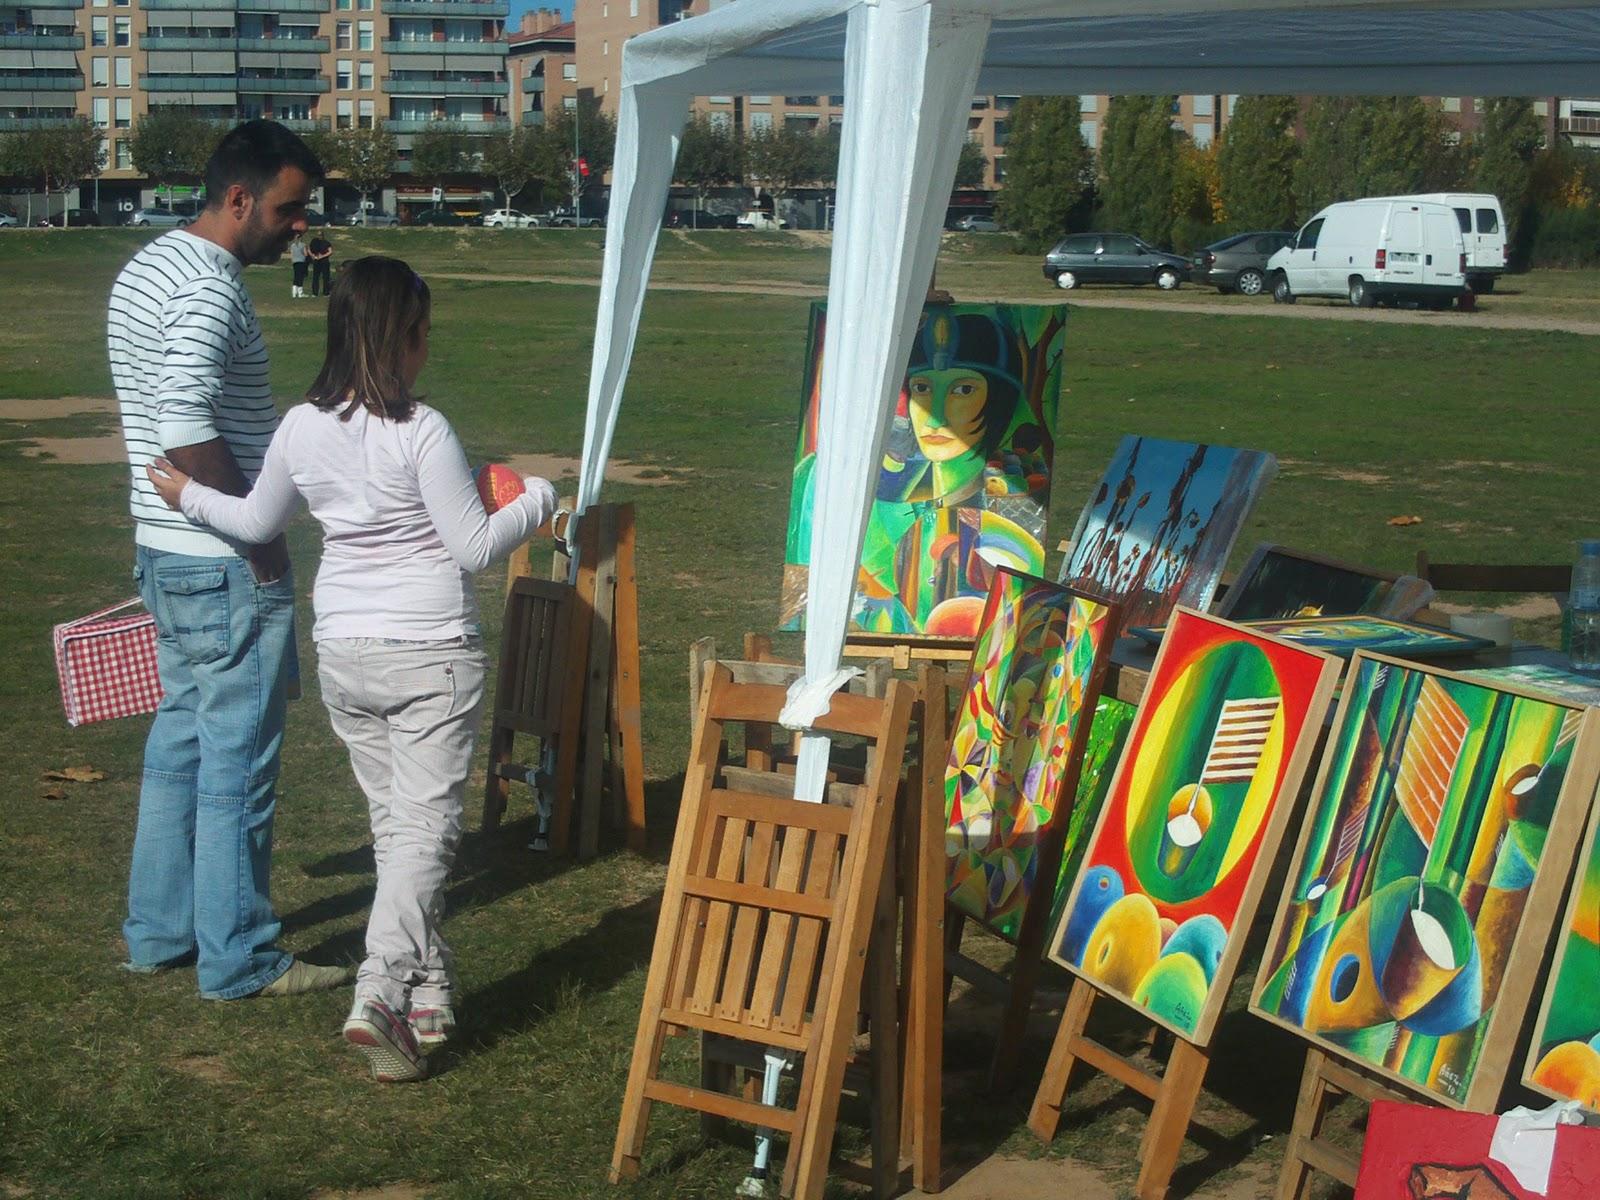 Grupo pintores latinoamericanos en catalunya gpala actividades participativas de gpala 2010 - Pintores de barcelona ...